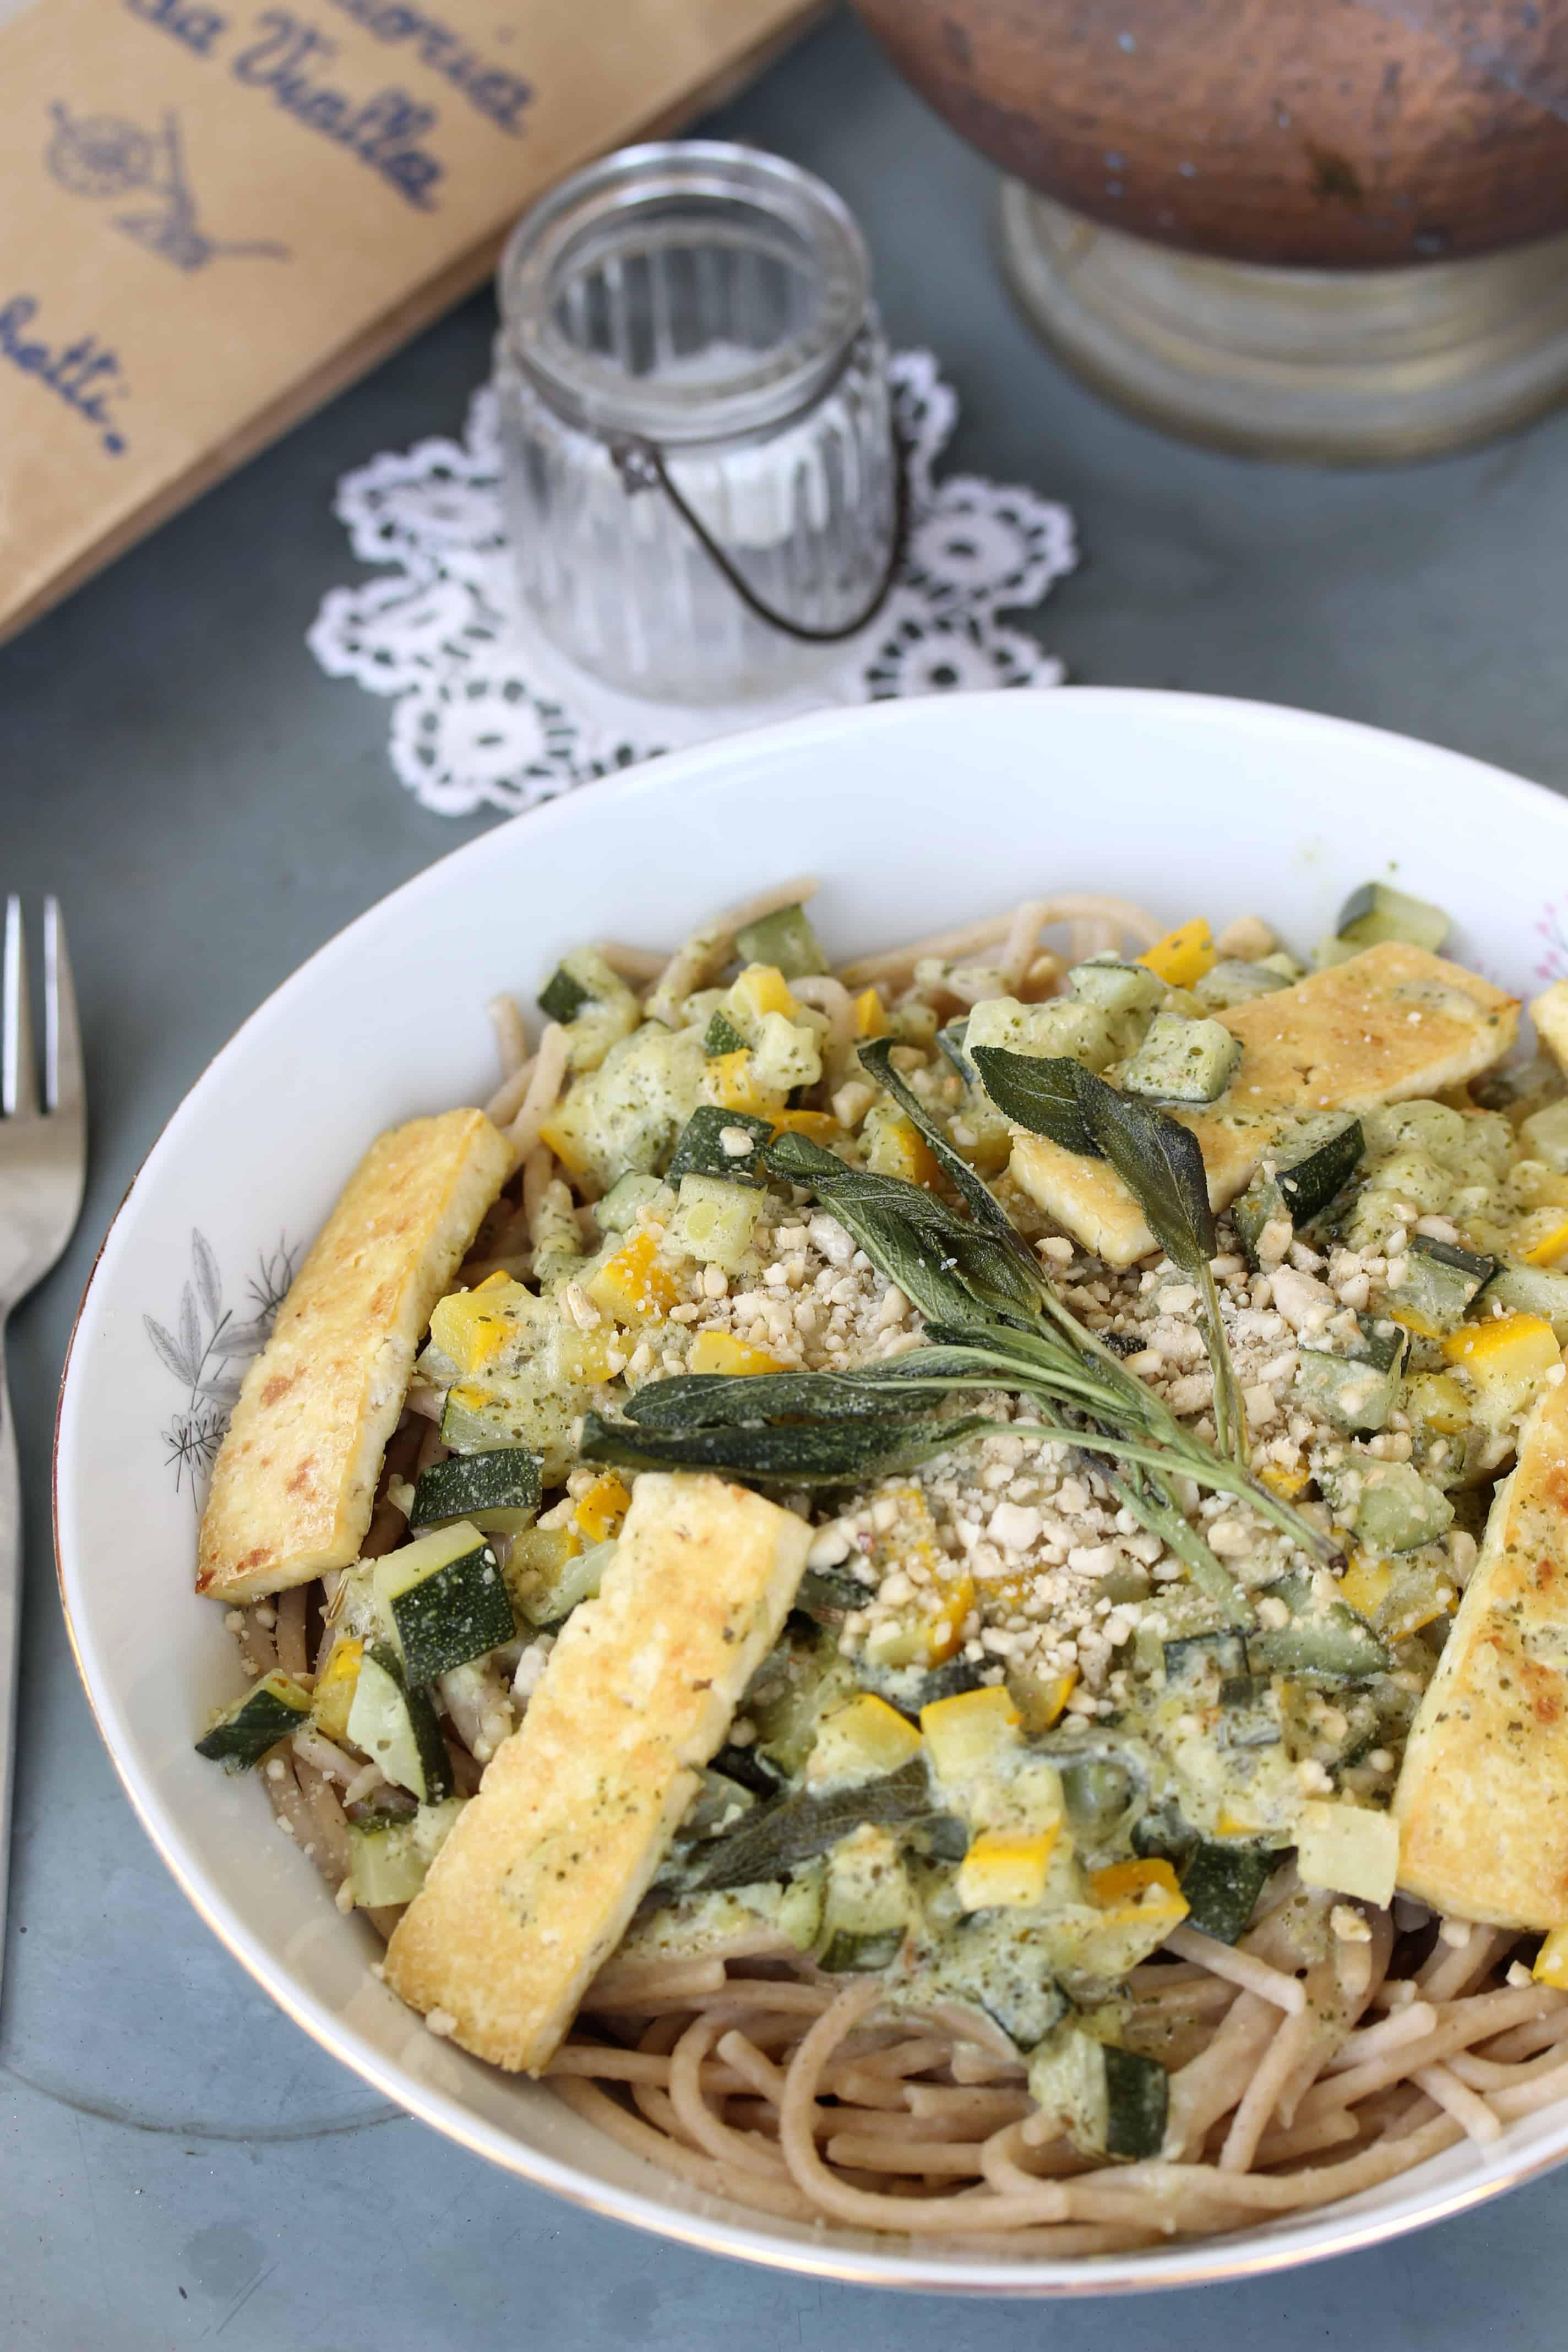 Barley Pasta, Vegan Zucchini Pesto Carbonara & Tofu Saltimbocca